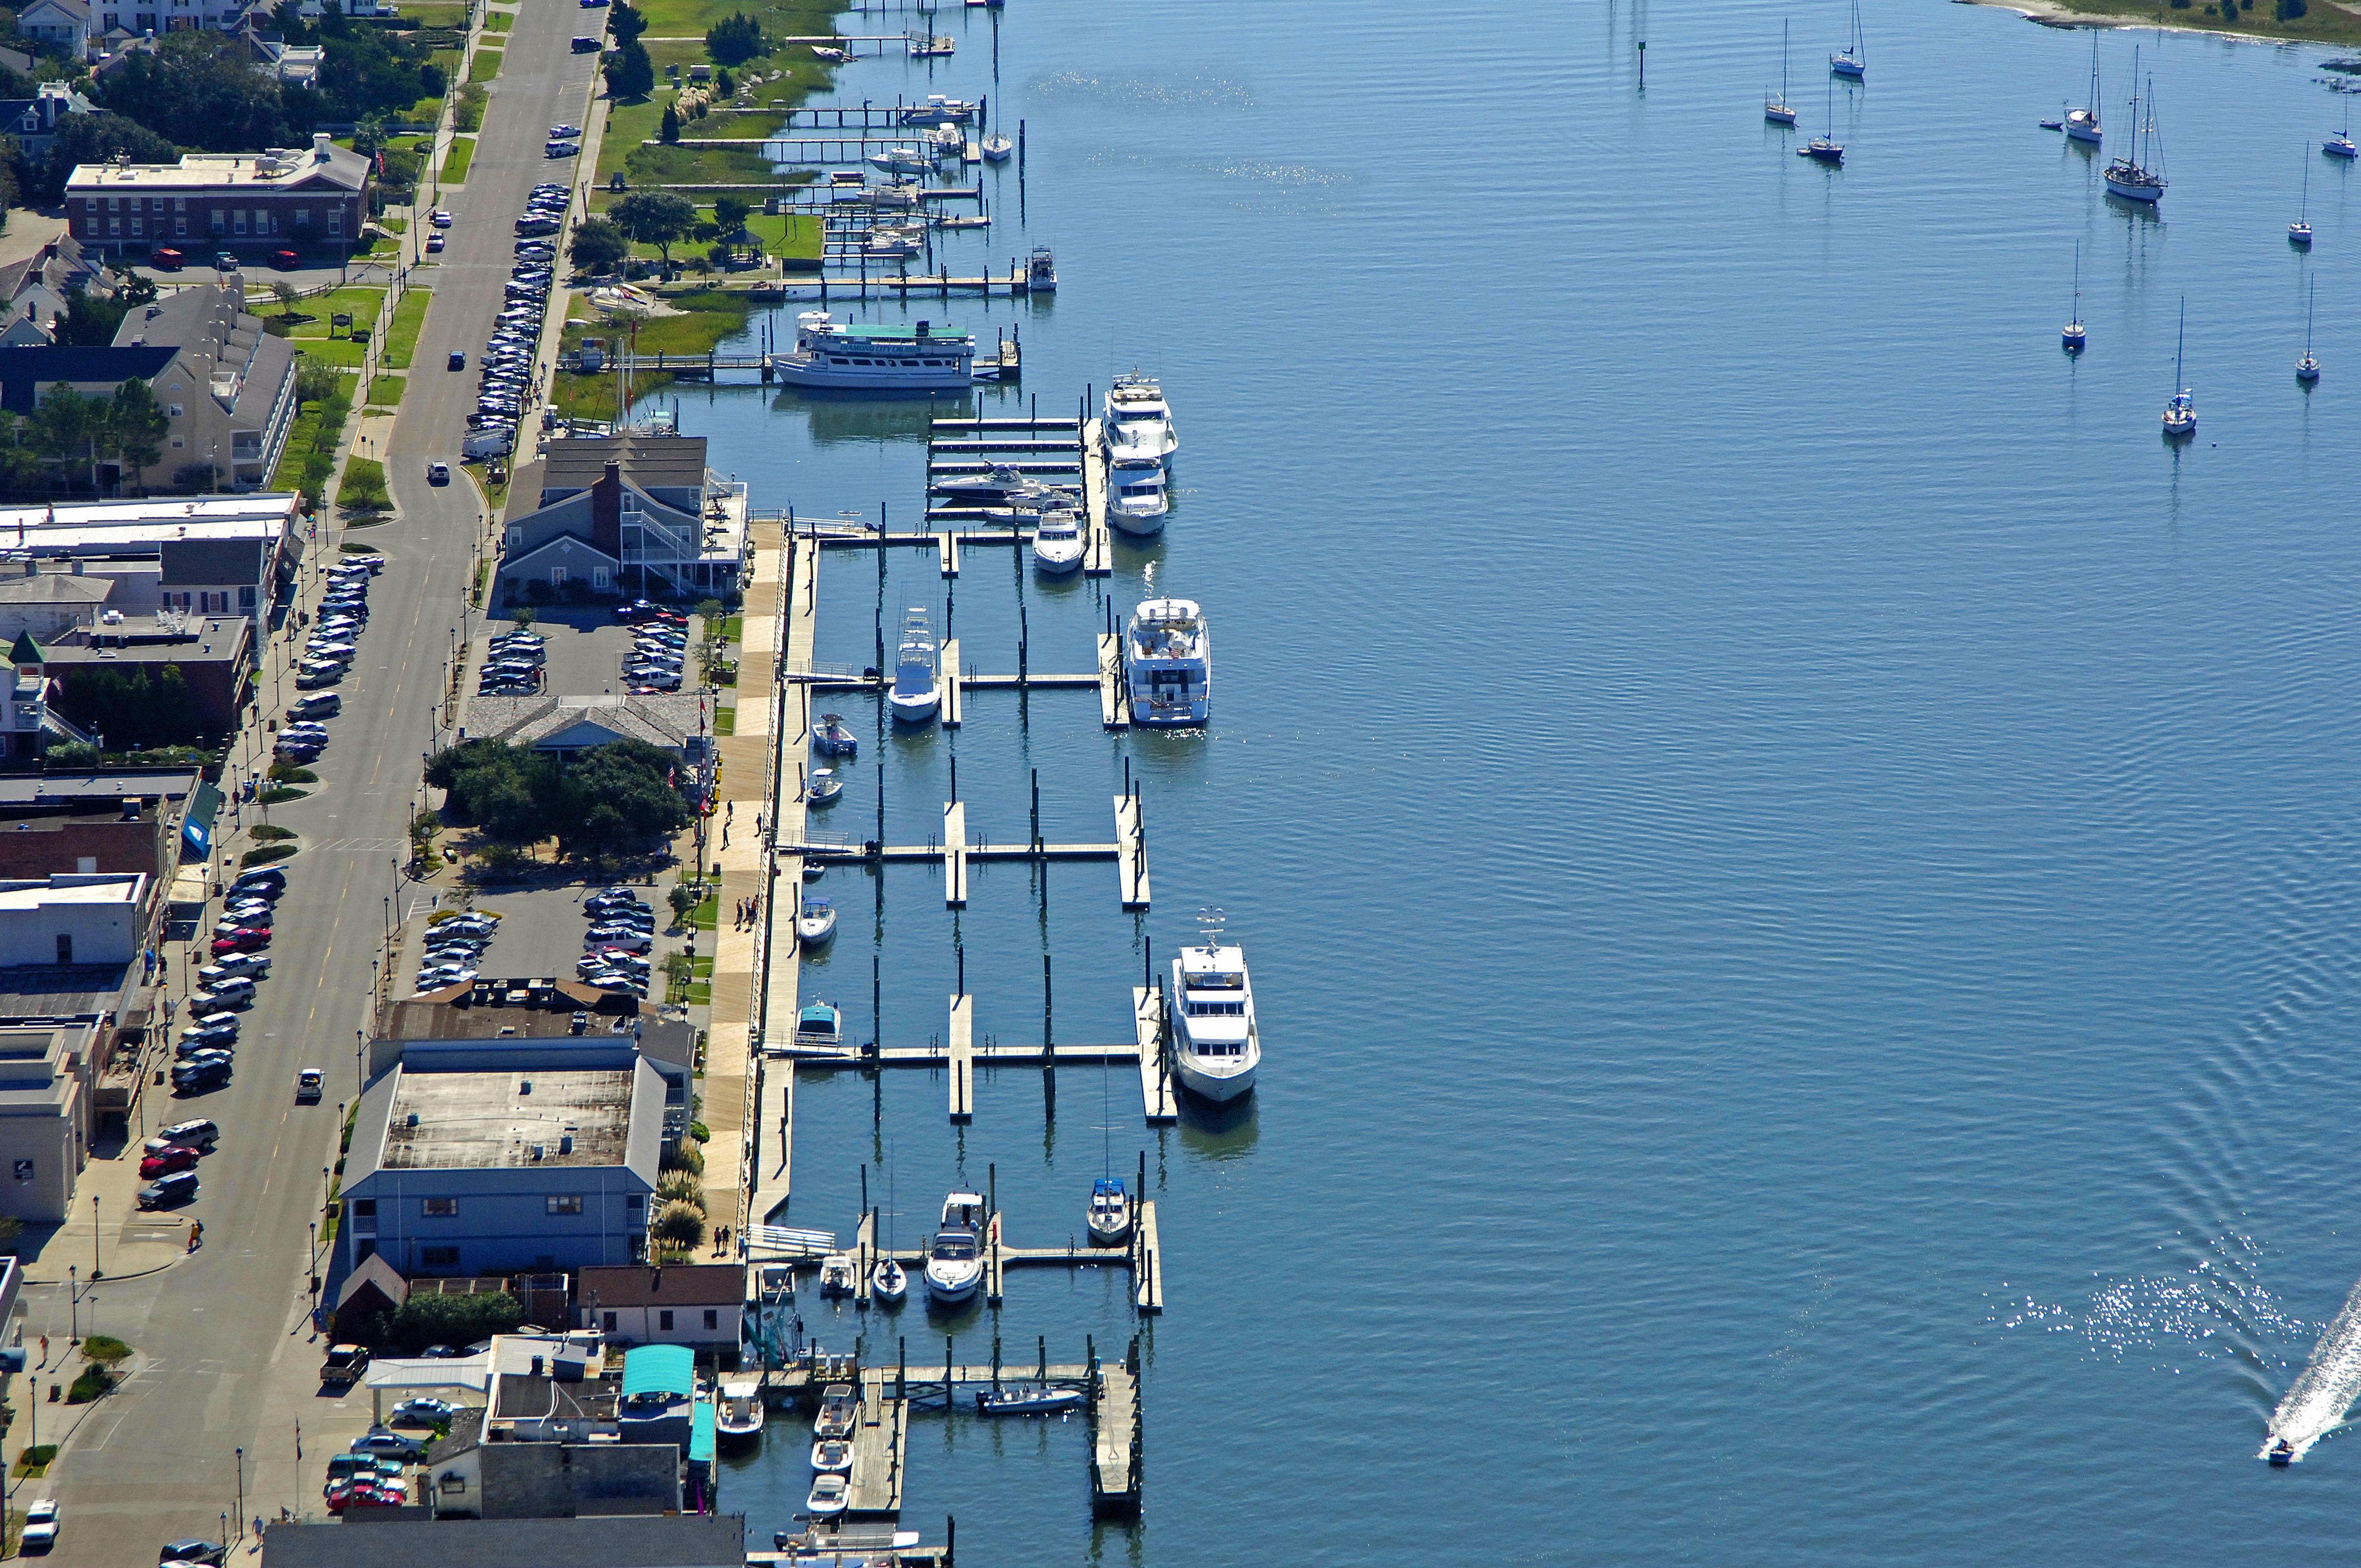 Beaufort Docks in Beaufort, NC, United States - Marina